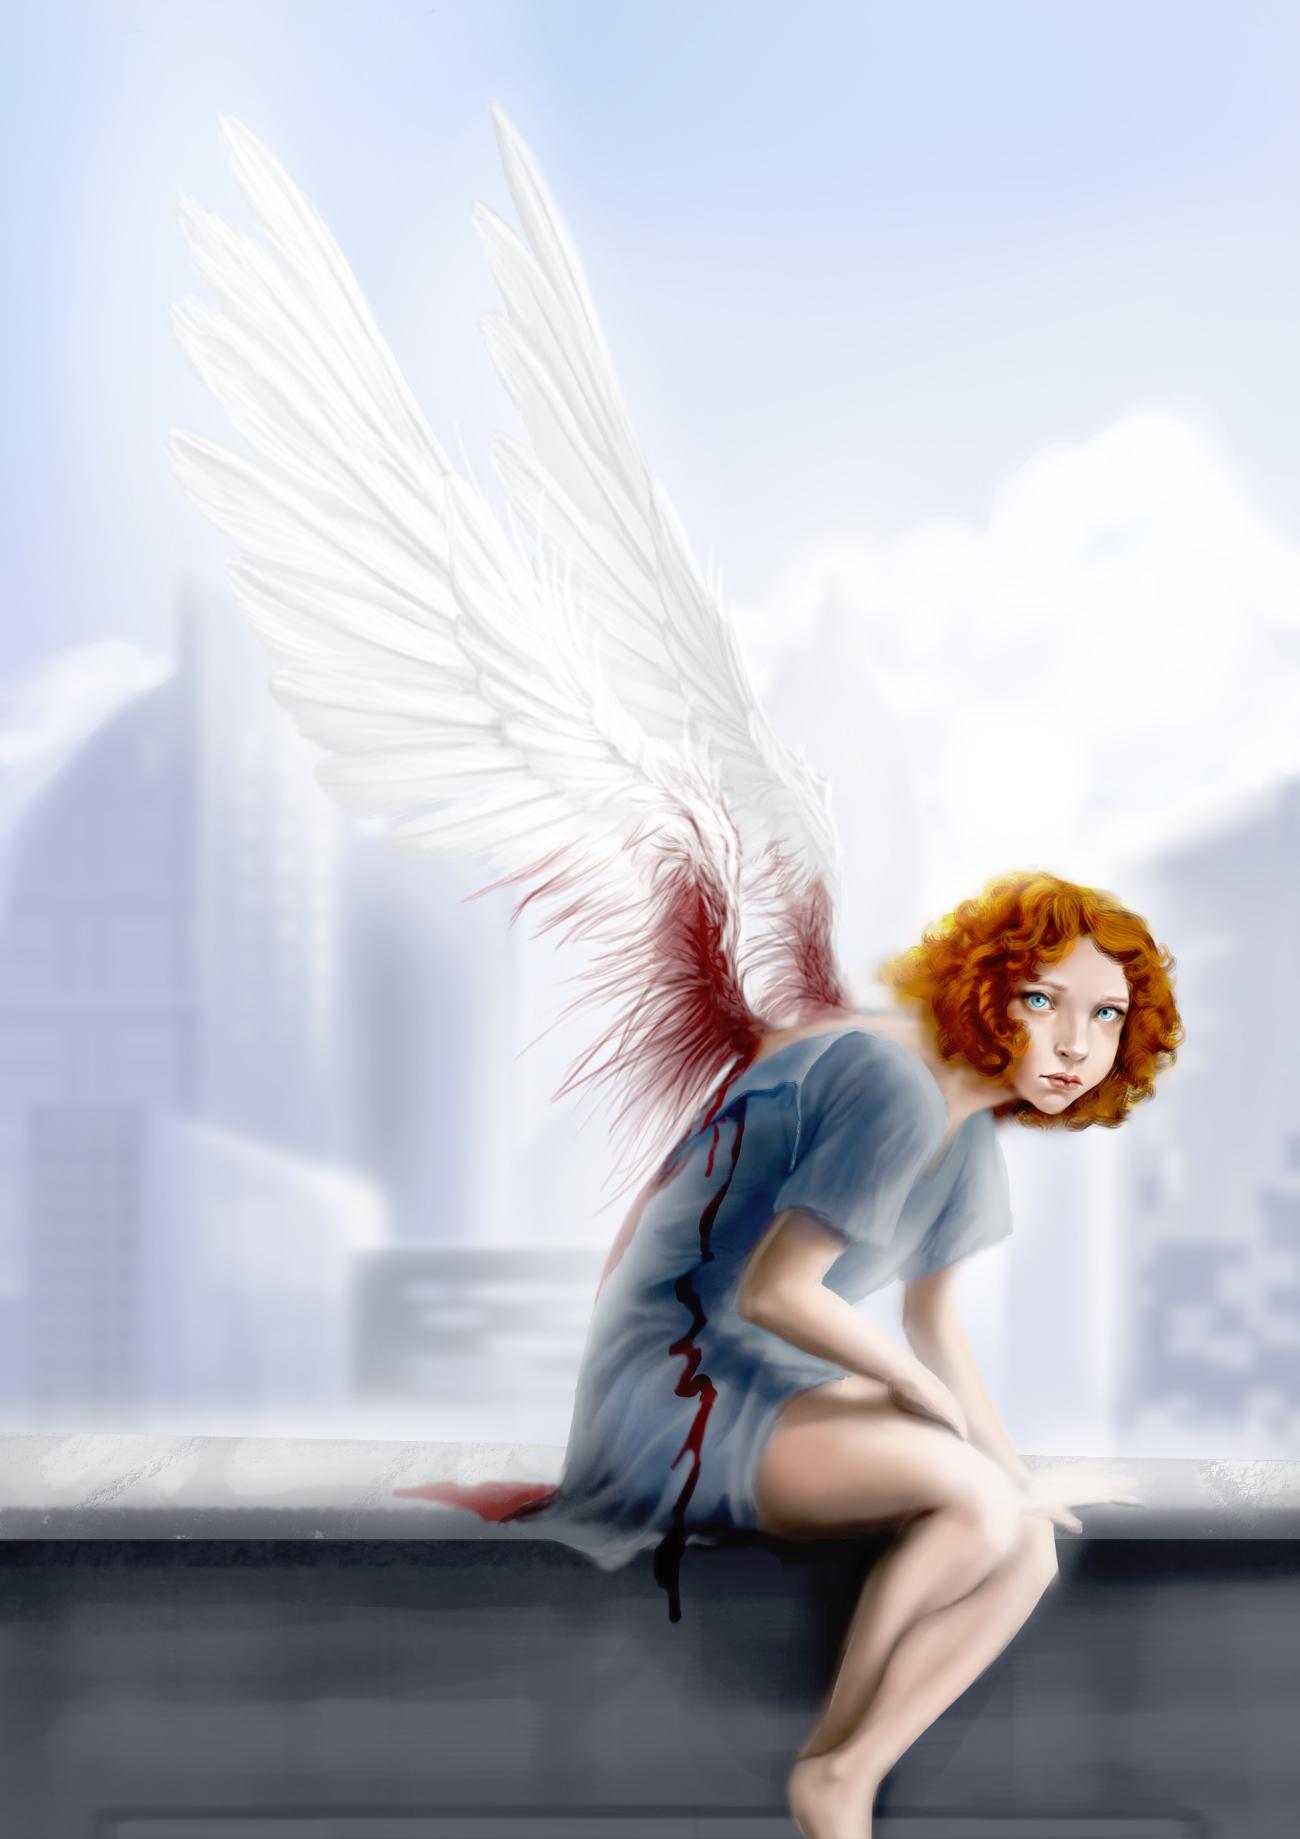 The Passing of Emma Reid